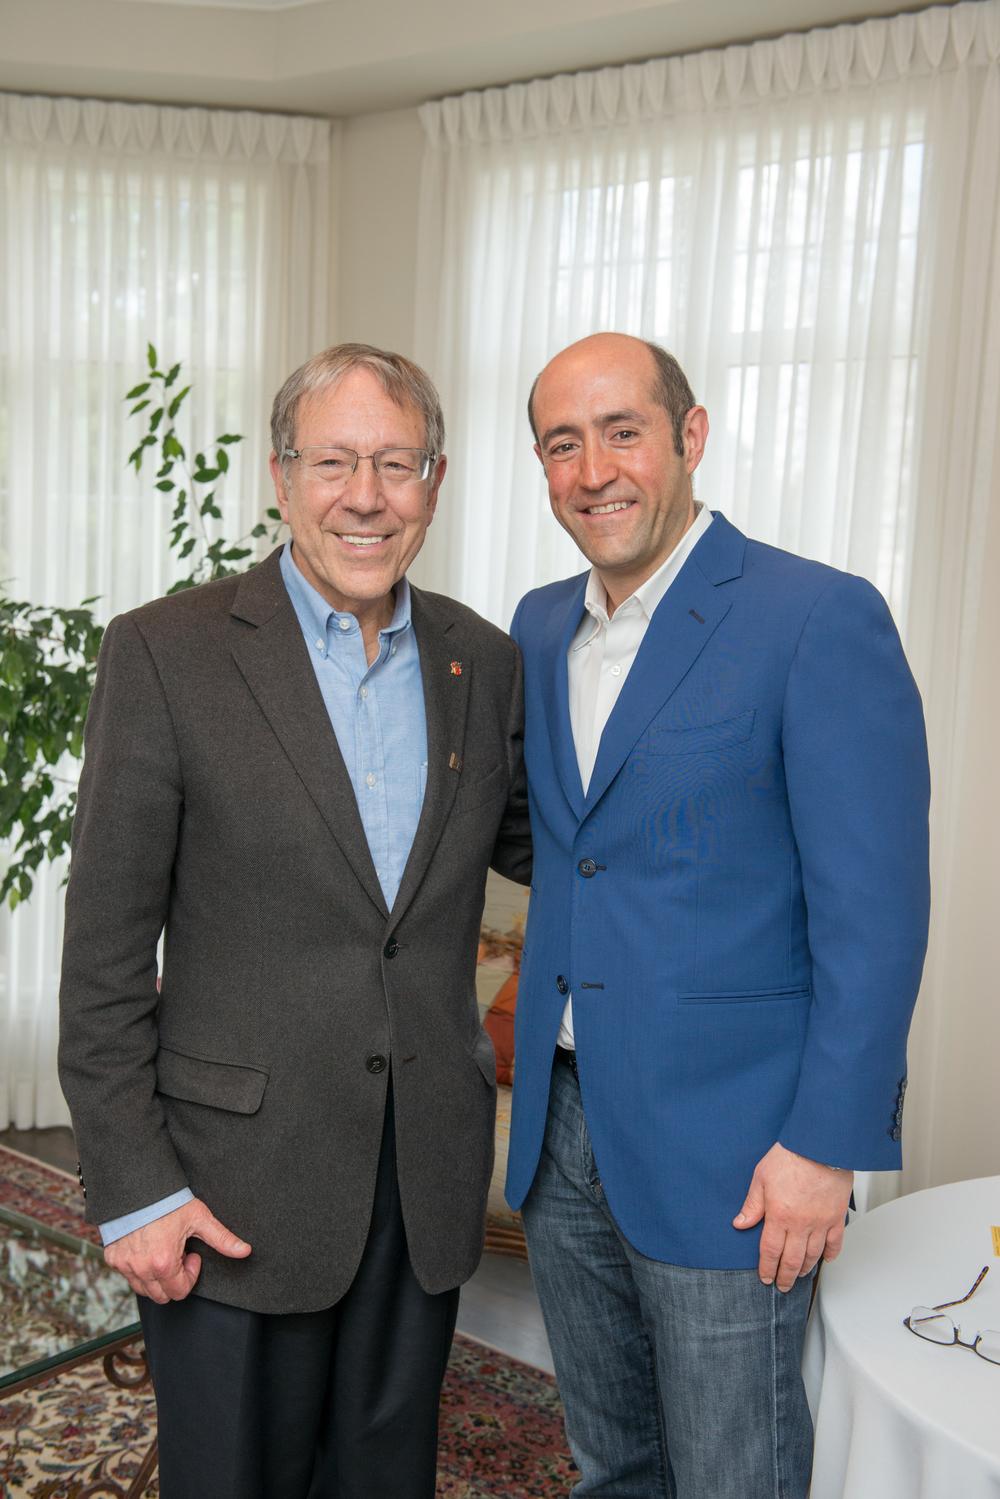 Jay Rosenzweig With Former Professor & Mentor Irwin Cotler